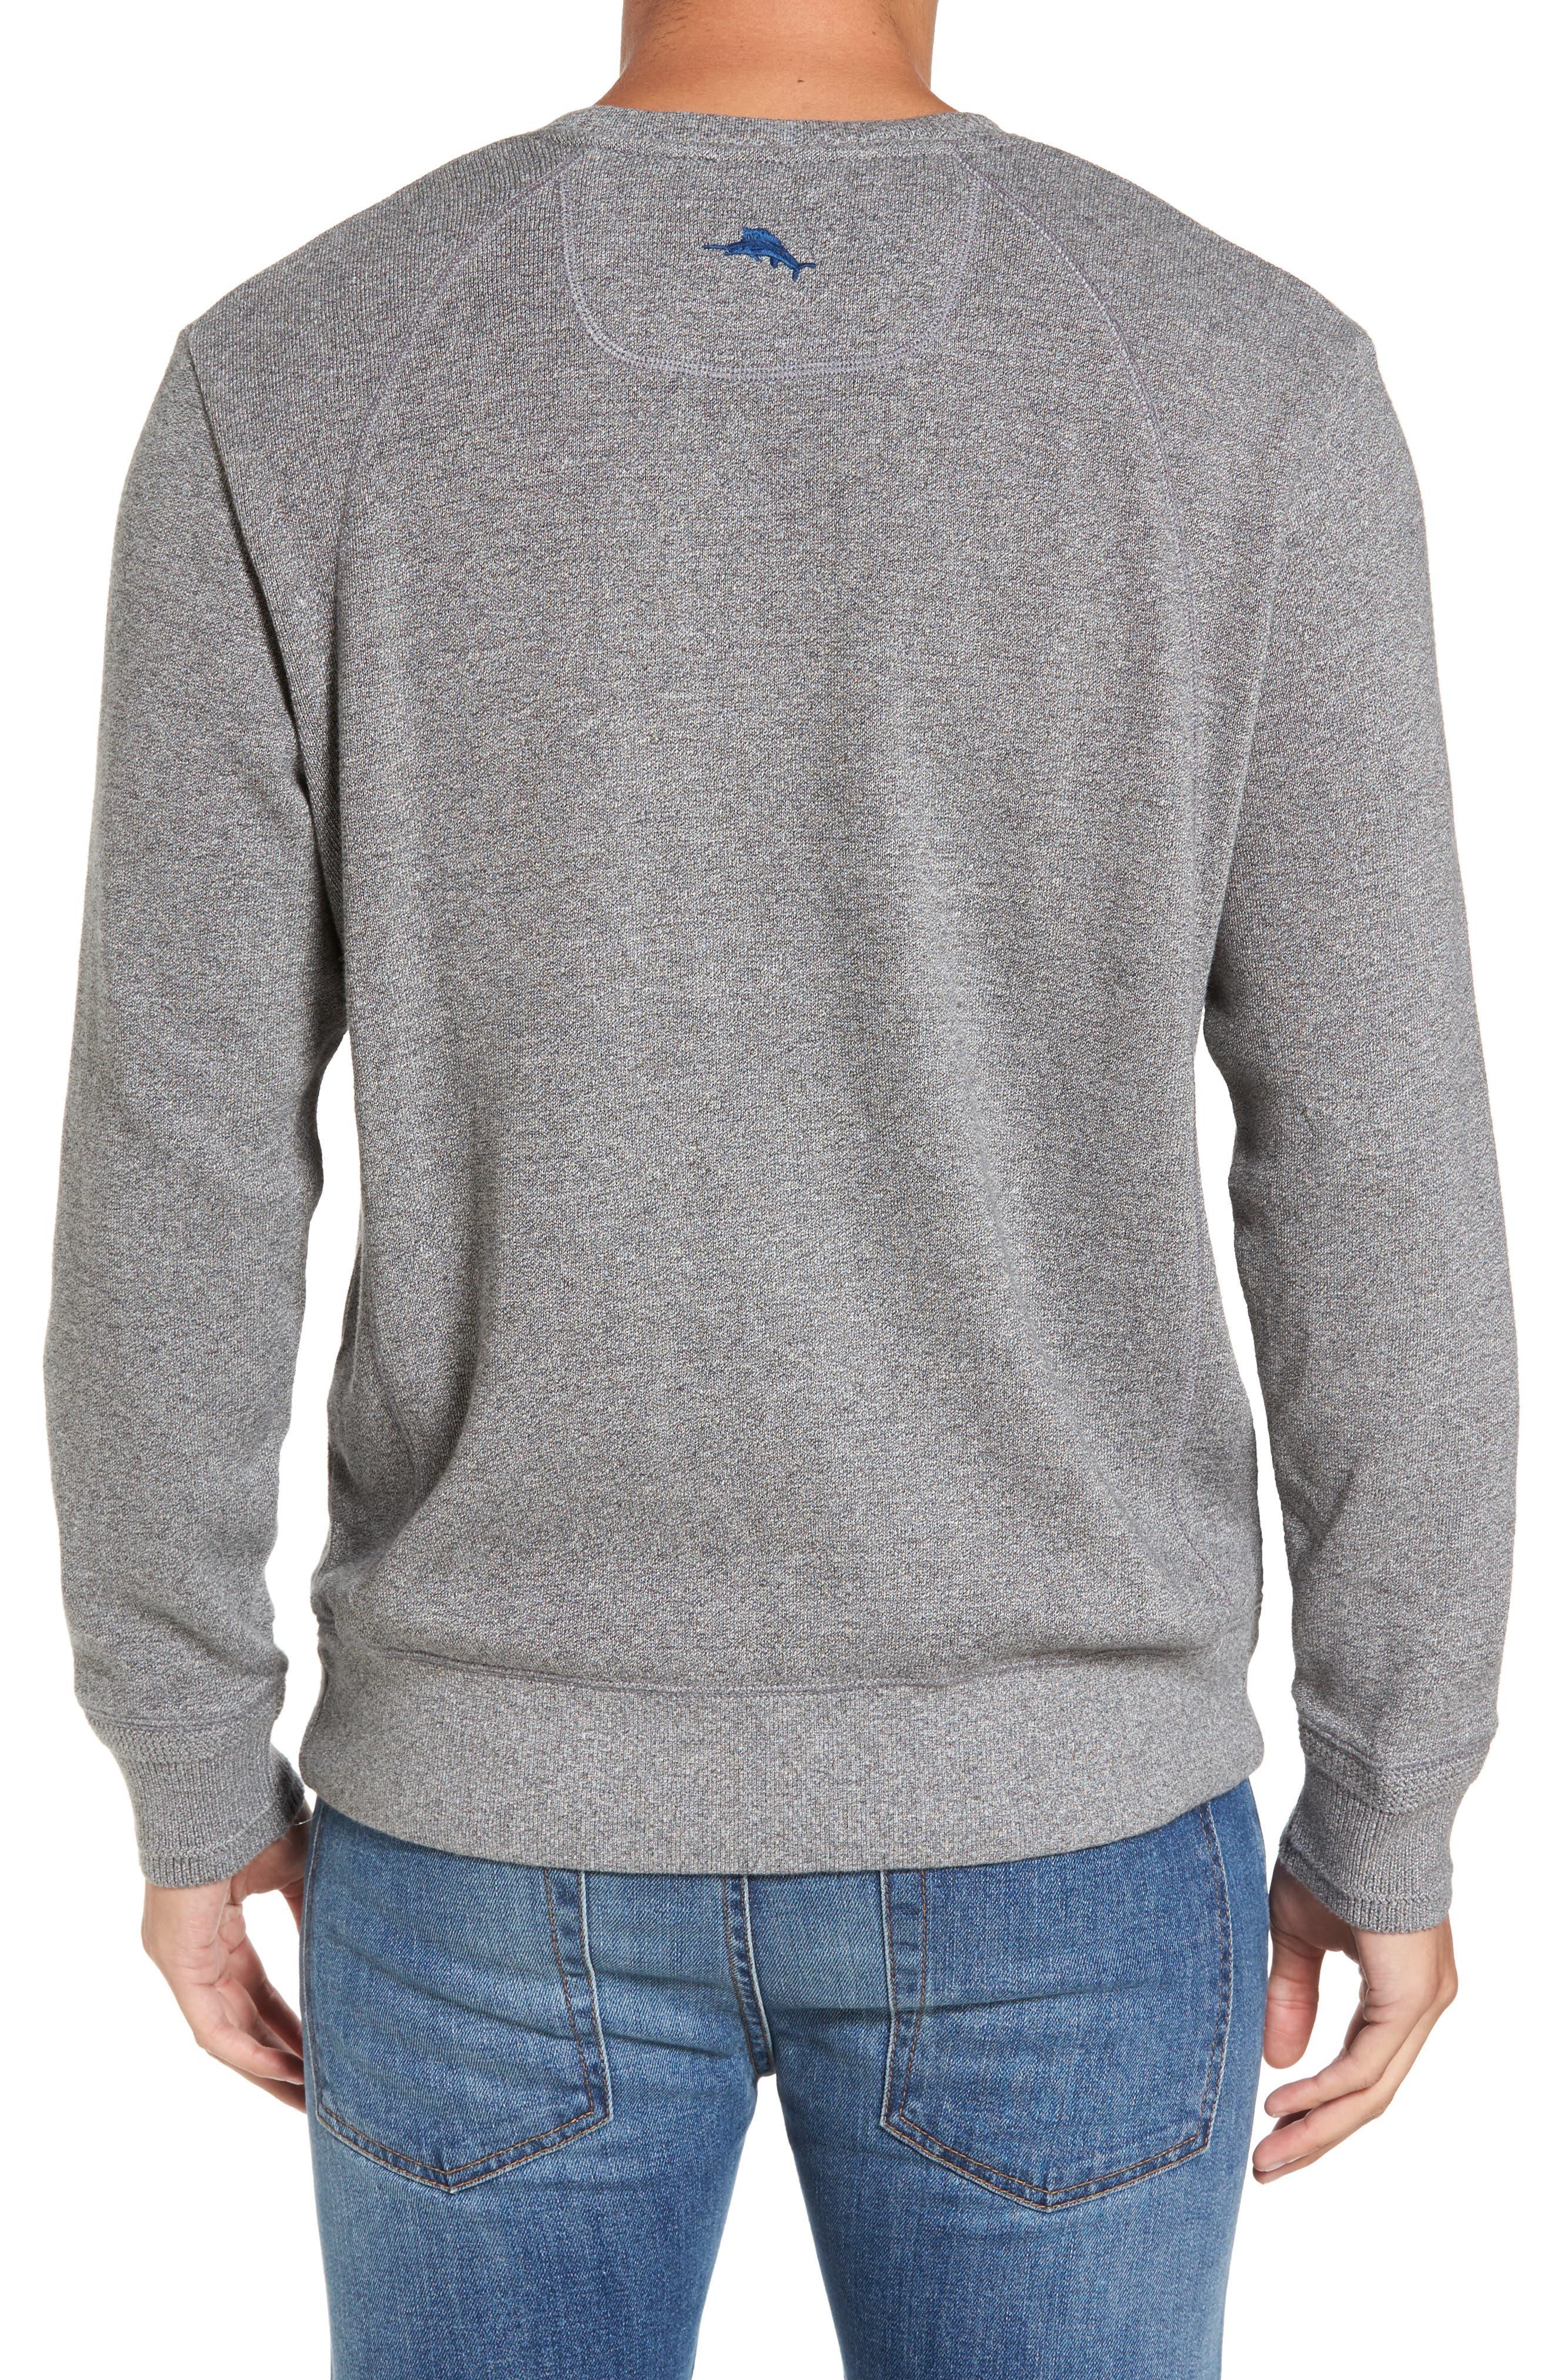 NFL Stitch of Liberty Embroidered Crewneck Sweatshirt,                             Alternate thumbnail 43, color,